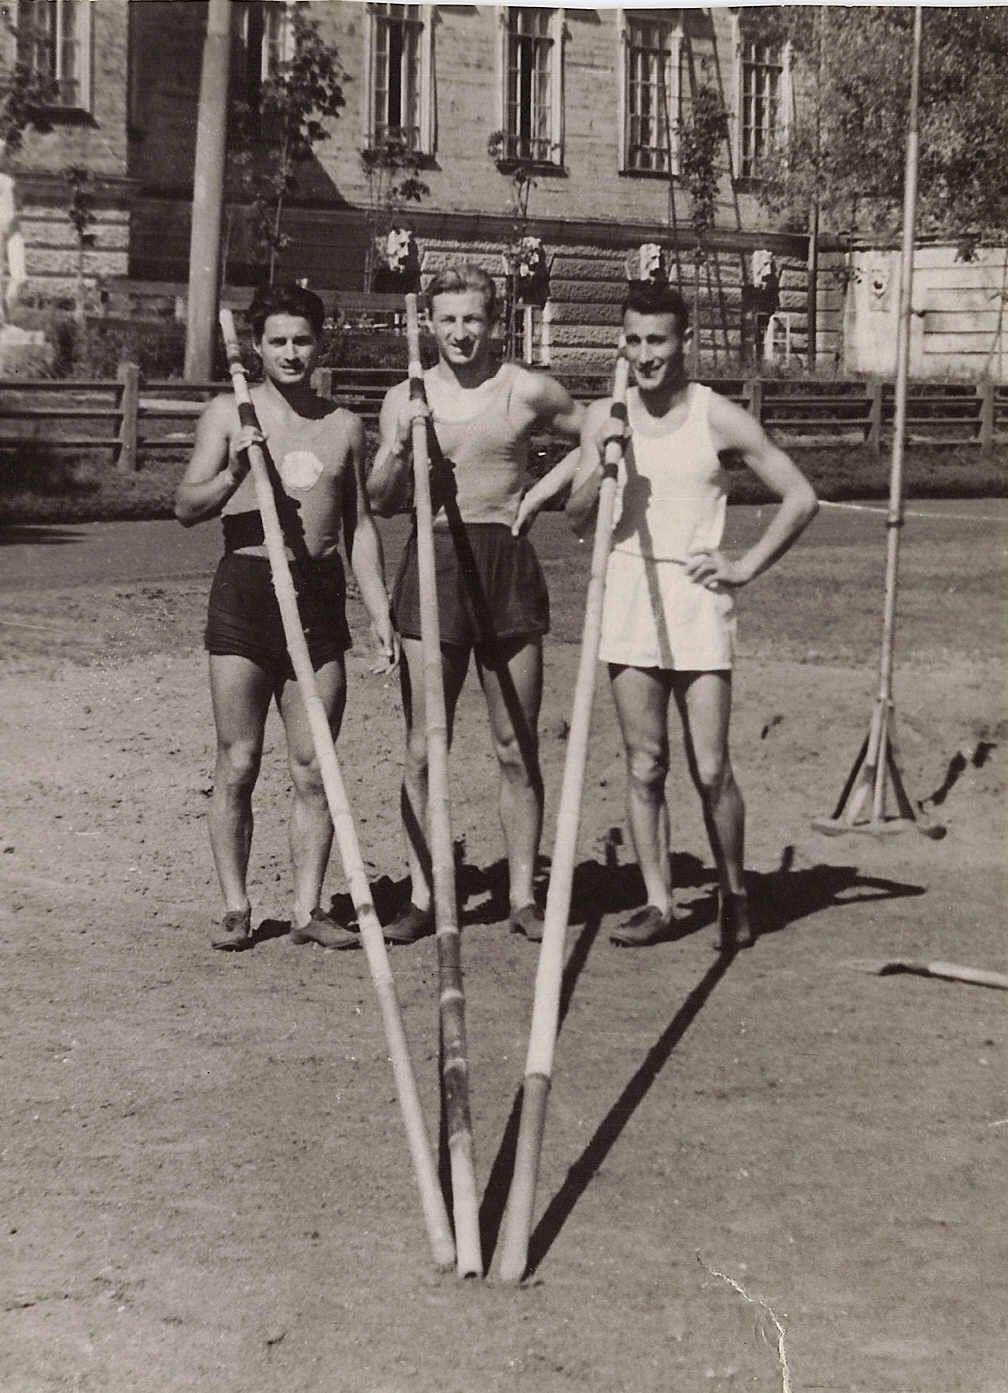 Moscow 1950 – Verkhoshansky, Yagodin (future coach of  Soviet Track & Field National Team), Topolijan (future Rector of  Armenian Institute of Physical Education & Sport)